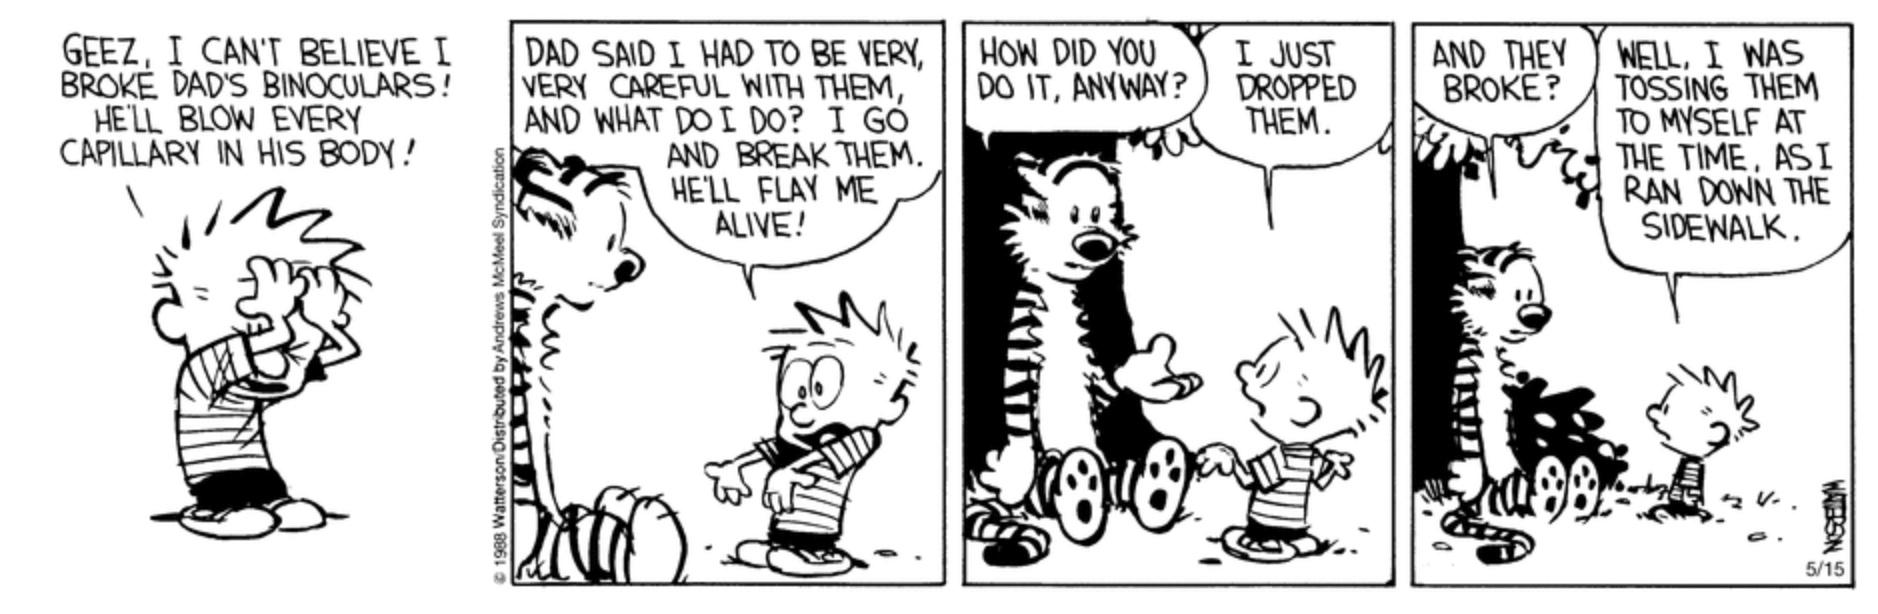 Calvin And Hobbes Page 95 Myfitnesspal